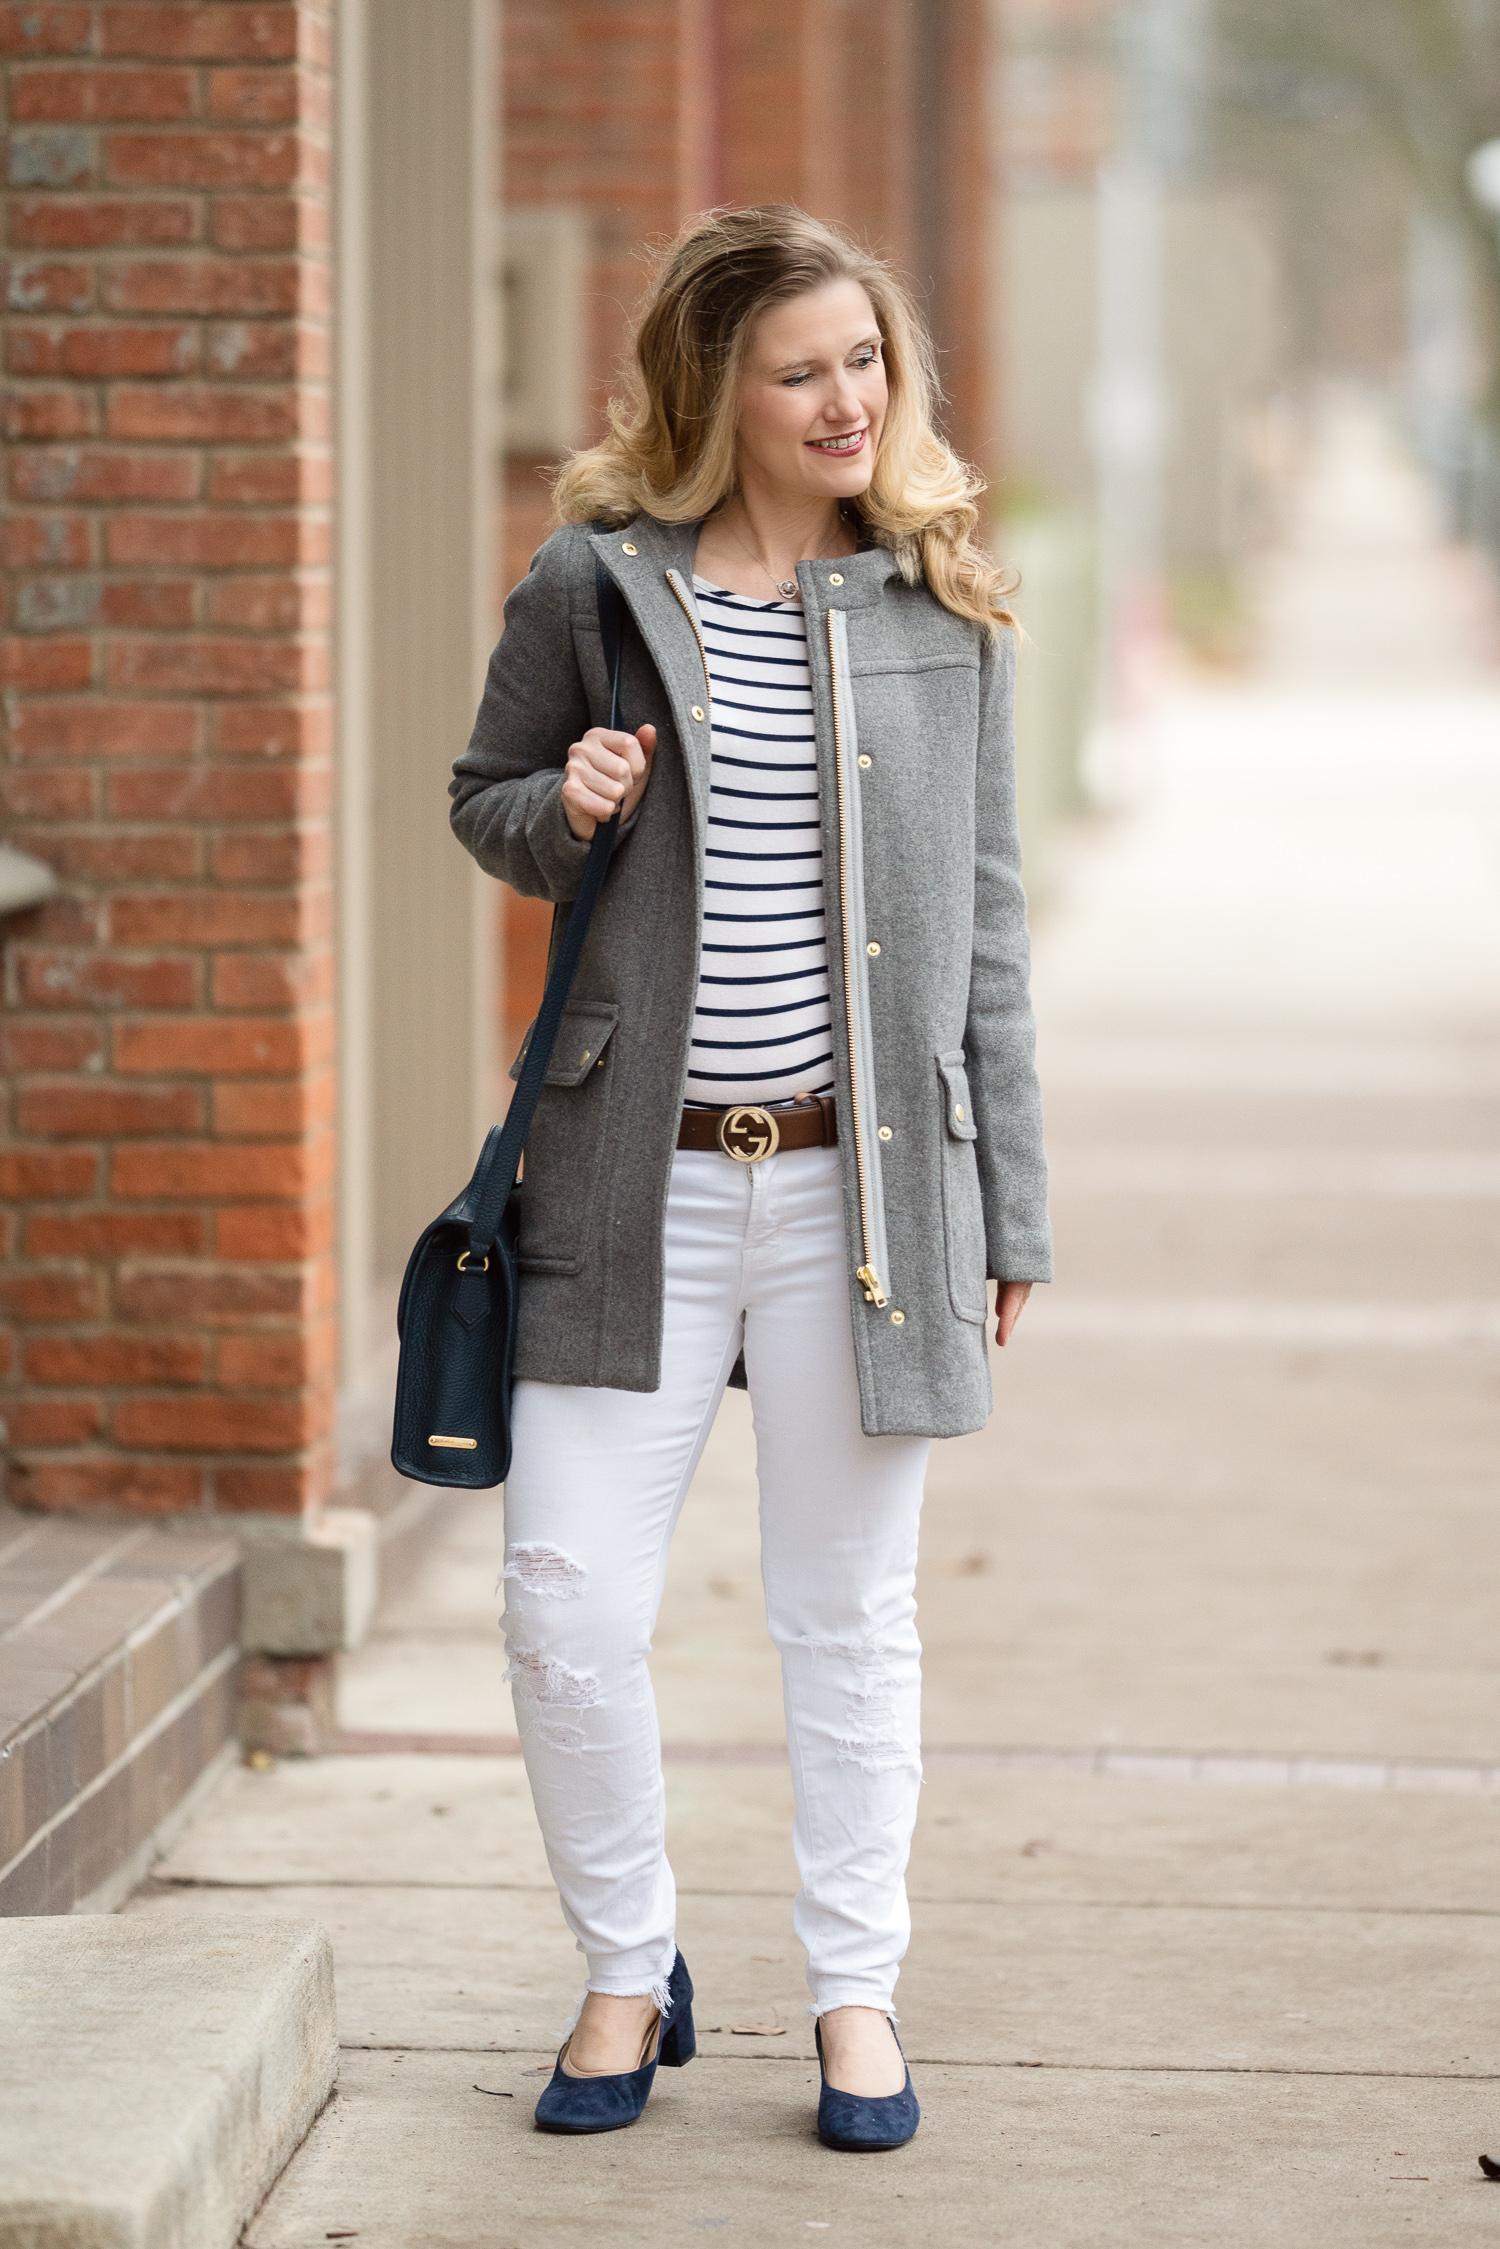 5a7b6e2c9dca Petite Fashion and Style Blog